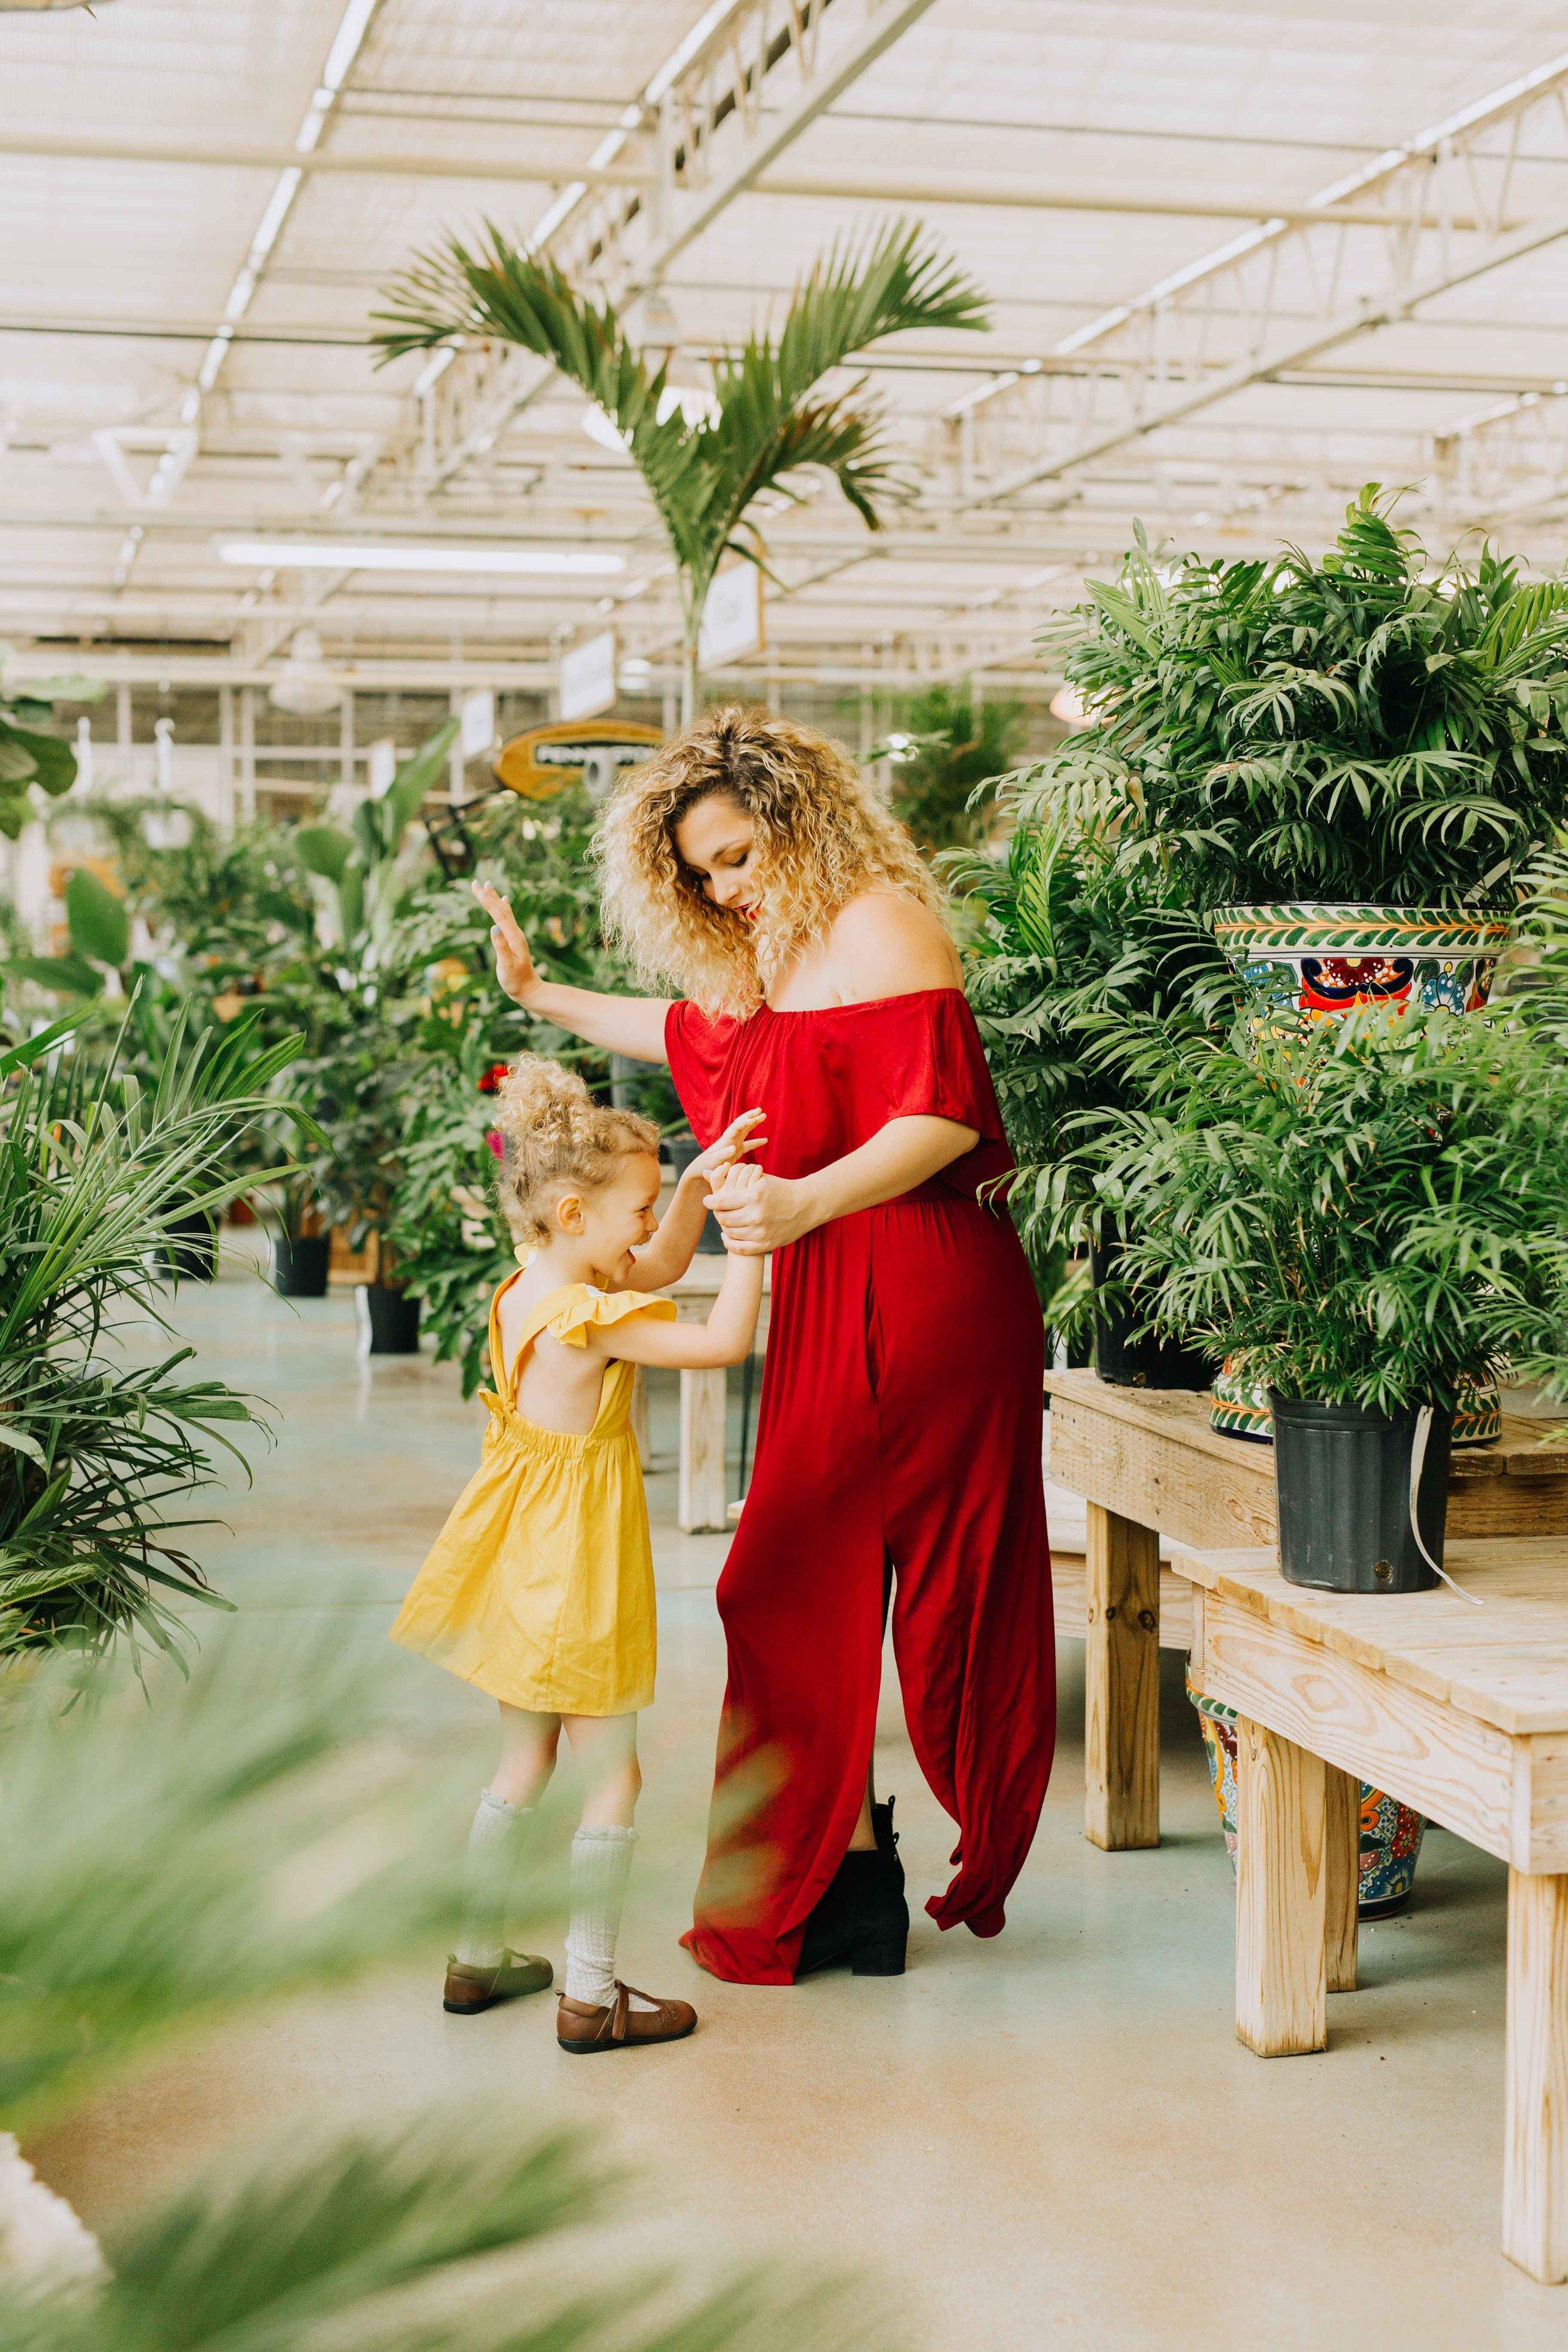 Merrifield-garden-greenhouse-indoor-Jacqueline-Waters-Photography-Red-dress-family- (96).jpg